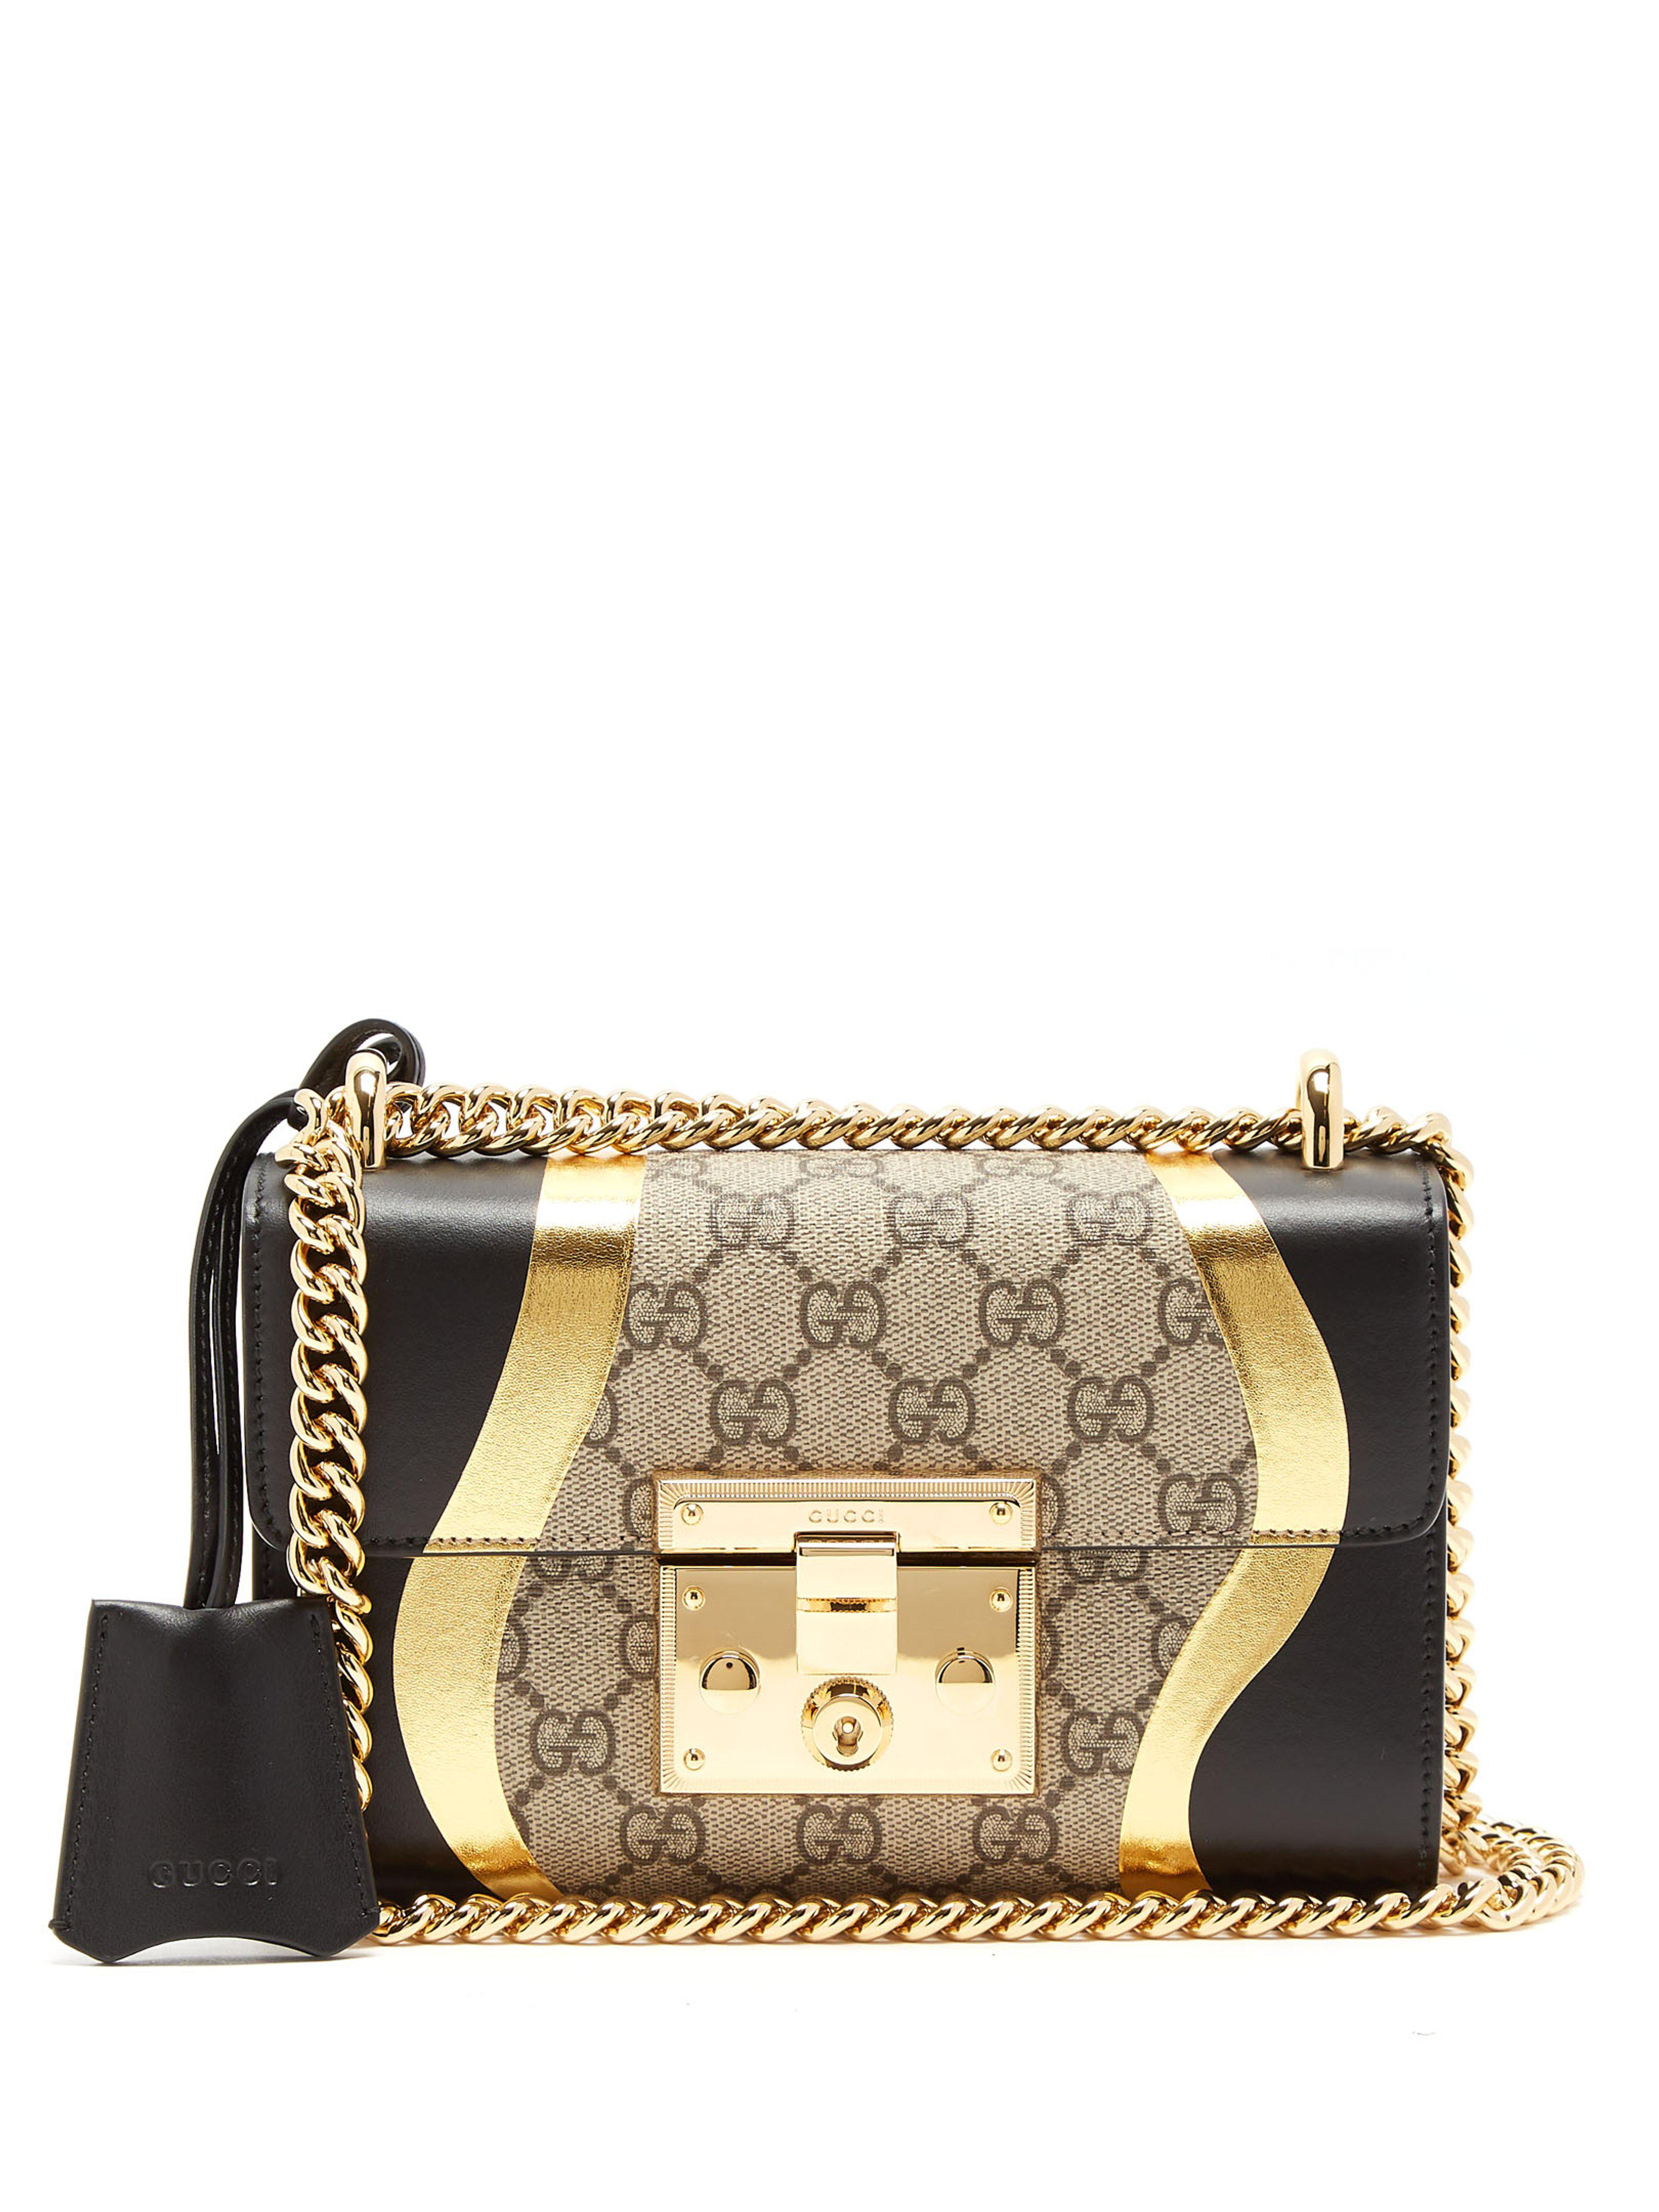 Gucci Padlock Gg Supreme Leather Shoulder Bag - Save 11% - Lyst be6ccc4b5f8d7